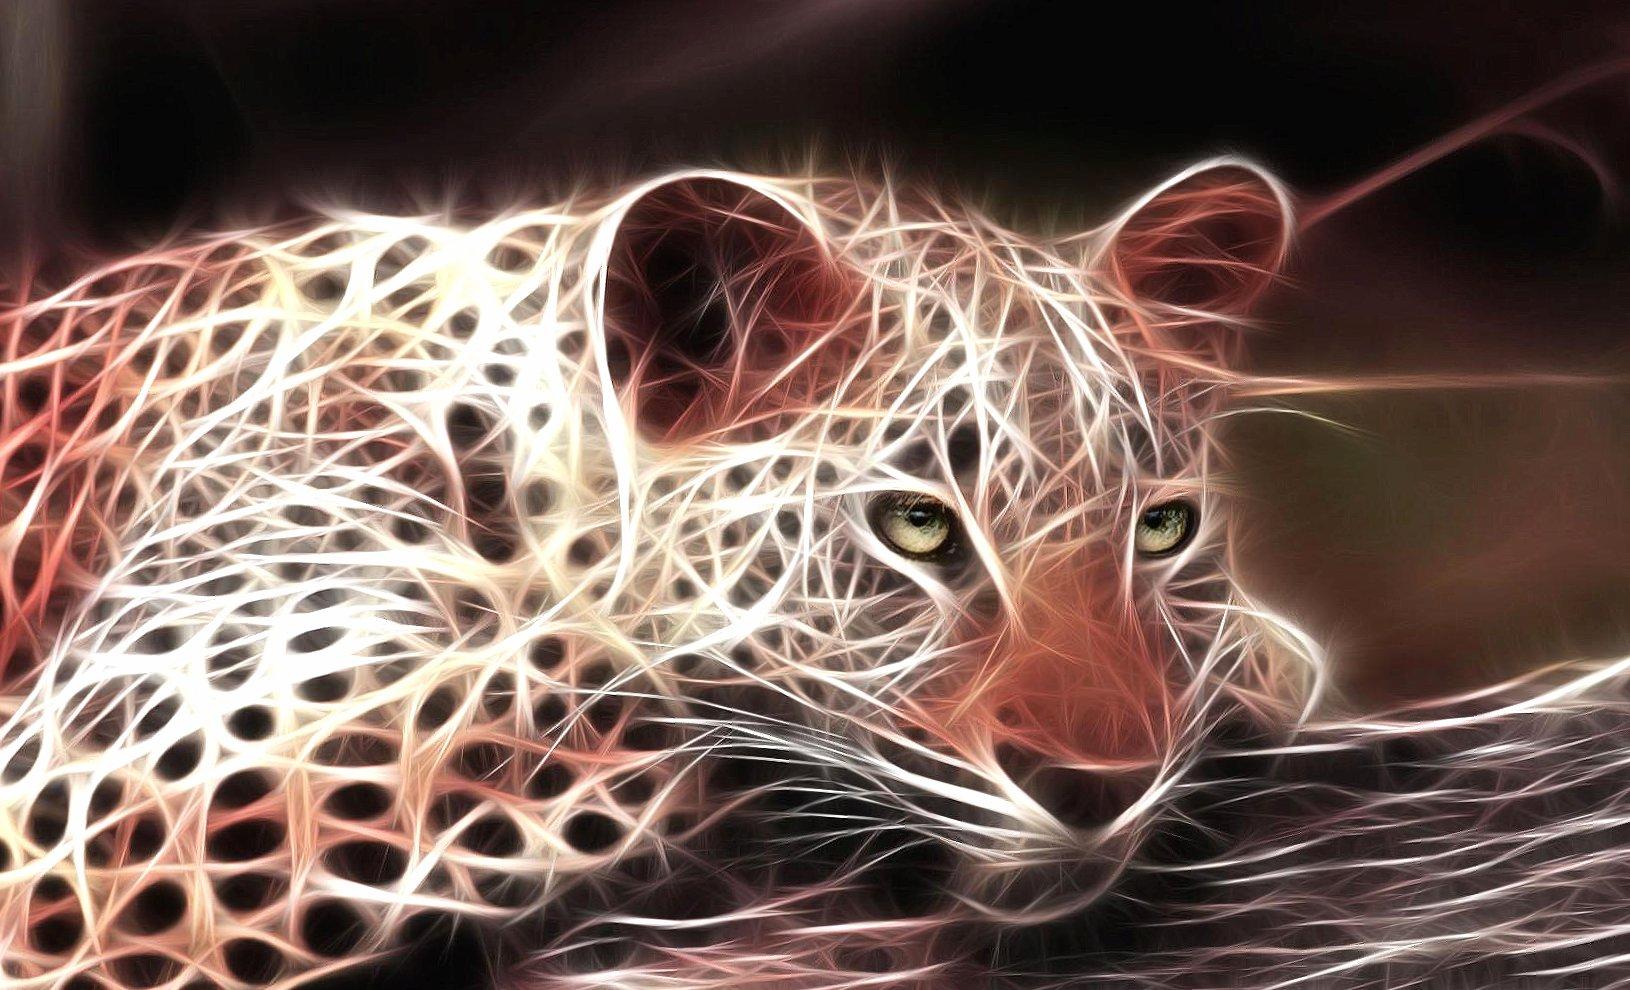 Jaguar digital light 3d wallpapers HD quality